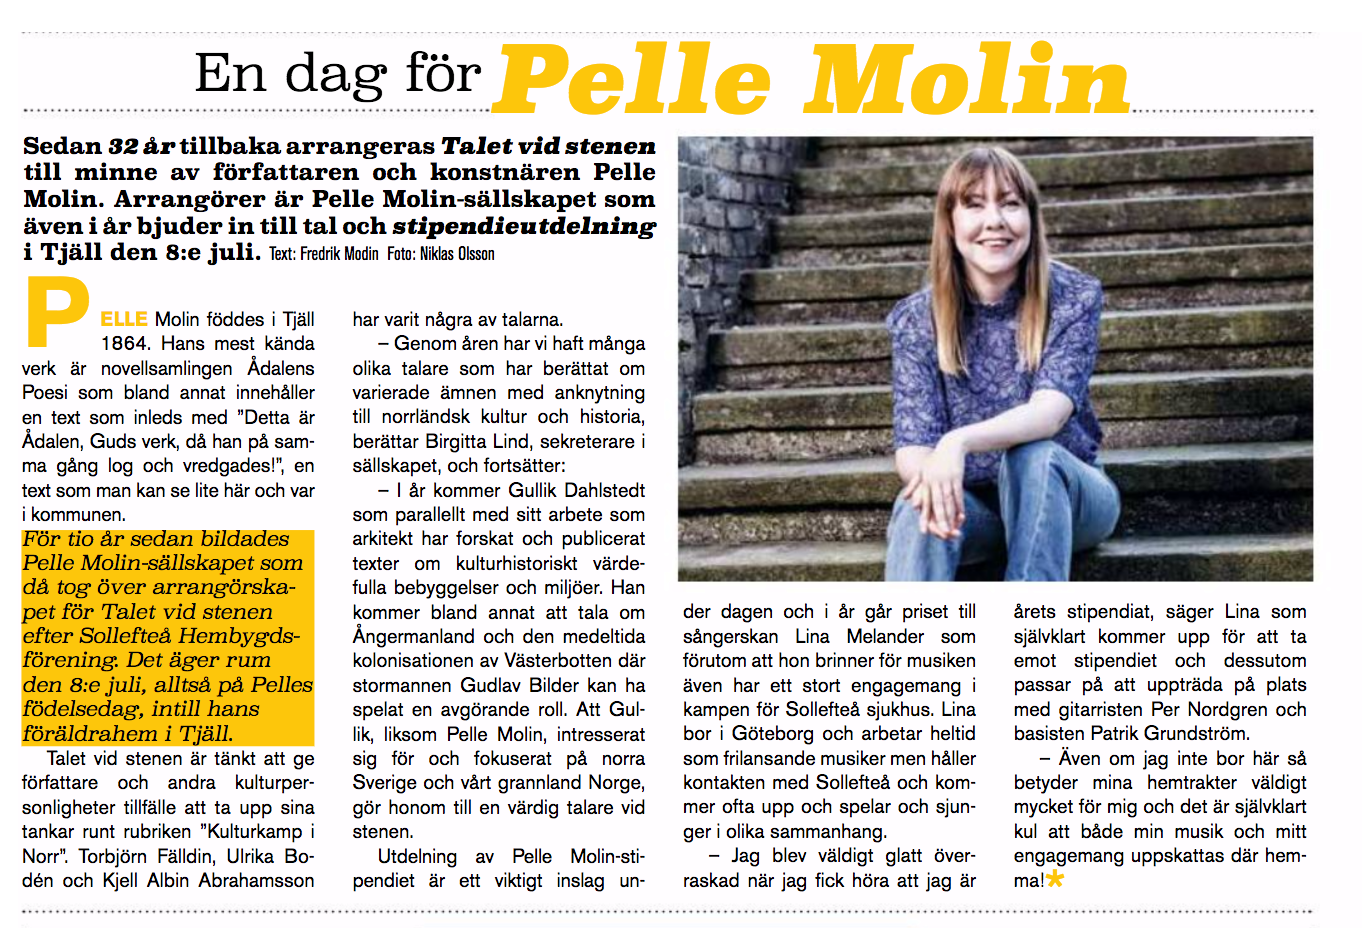 Pelle Molin Stipendiat 2017